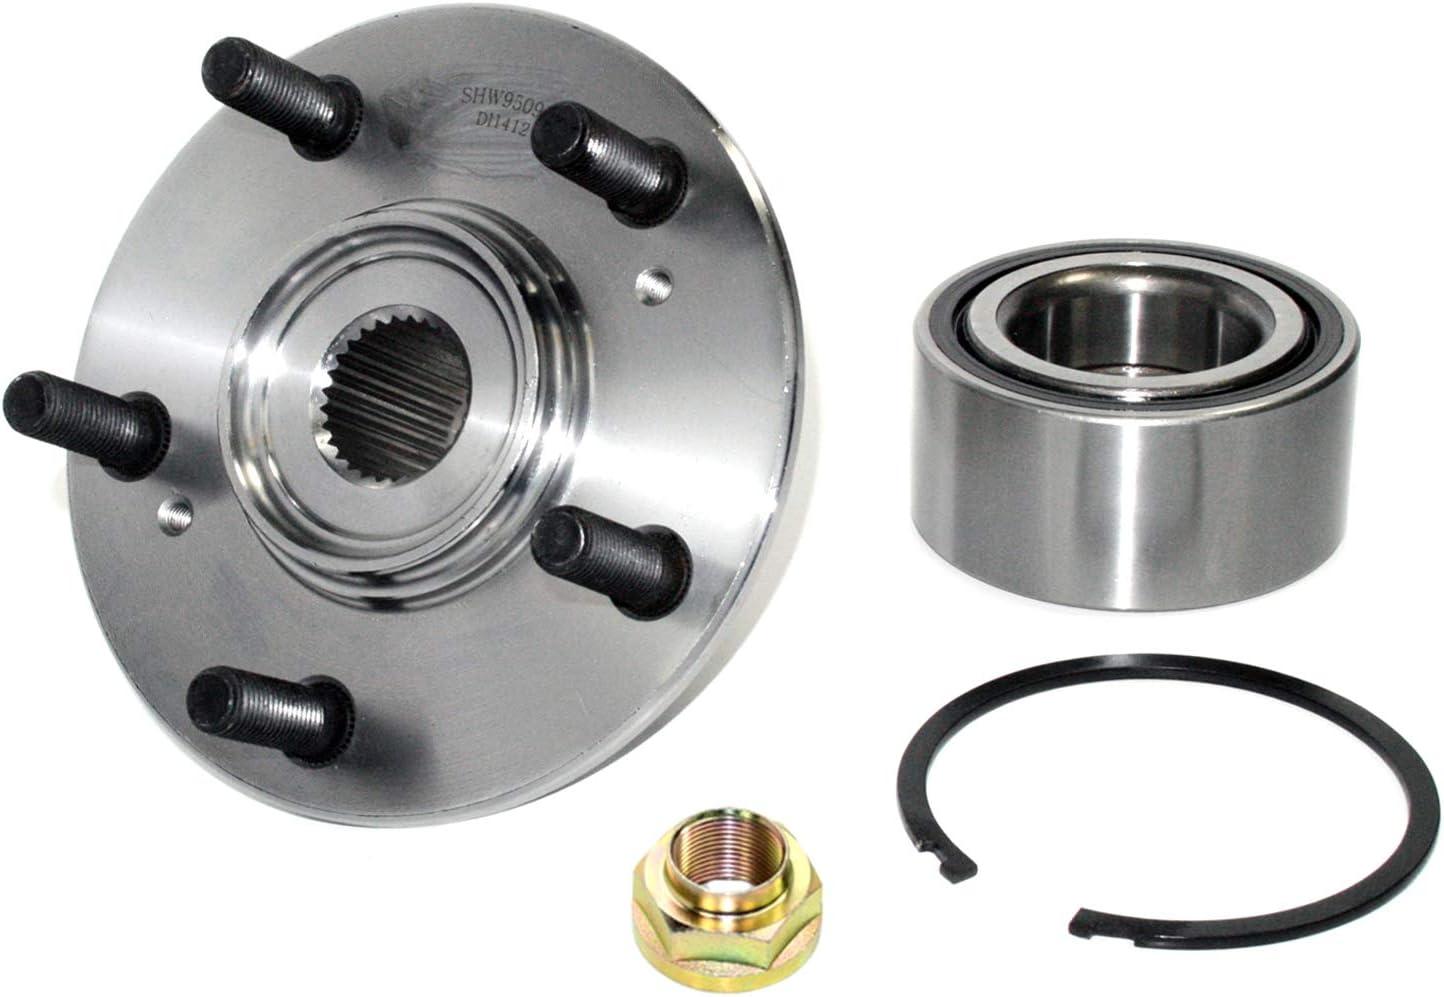 DuraGo 29596048 Front Wheel Hub Kit